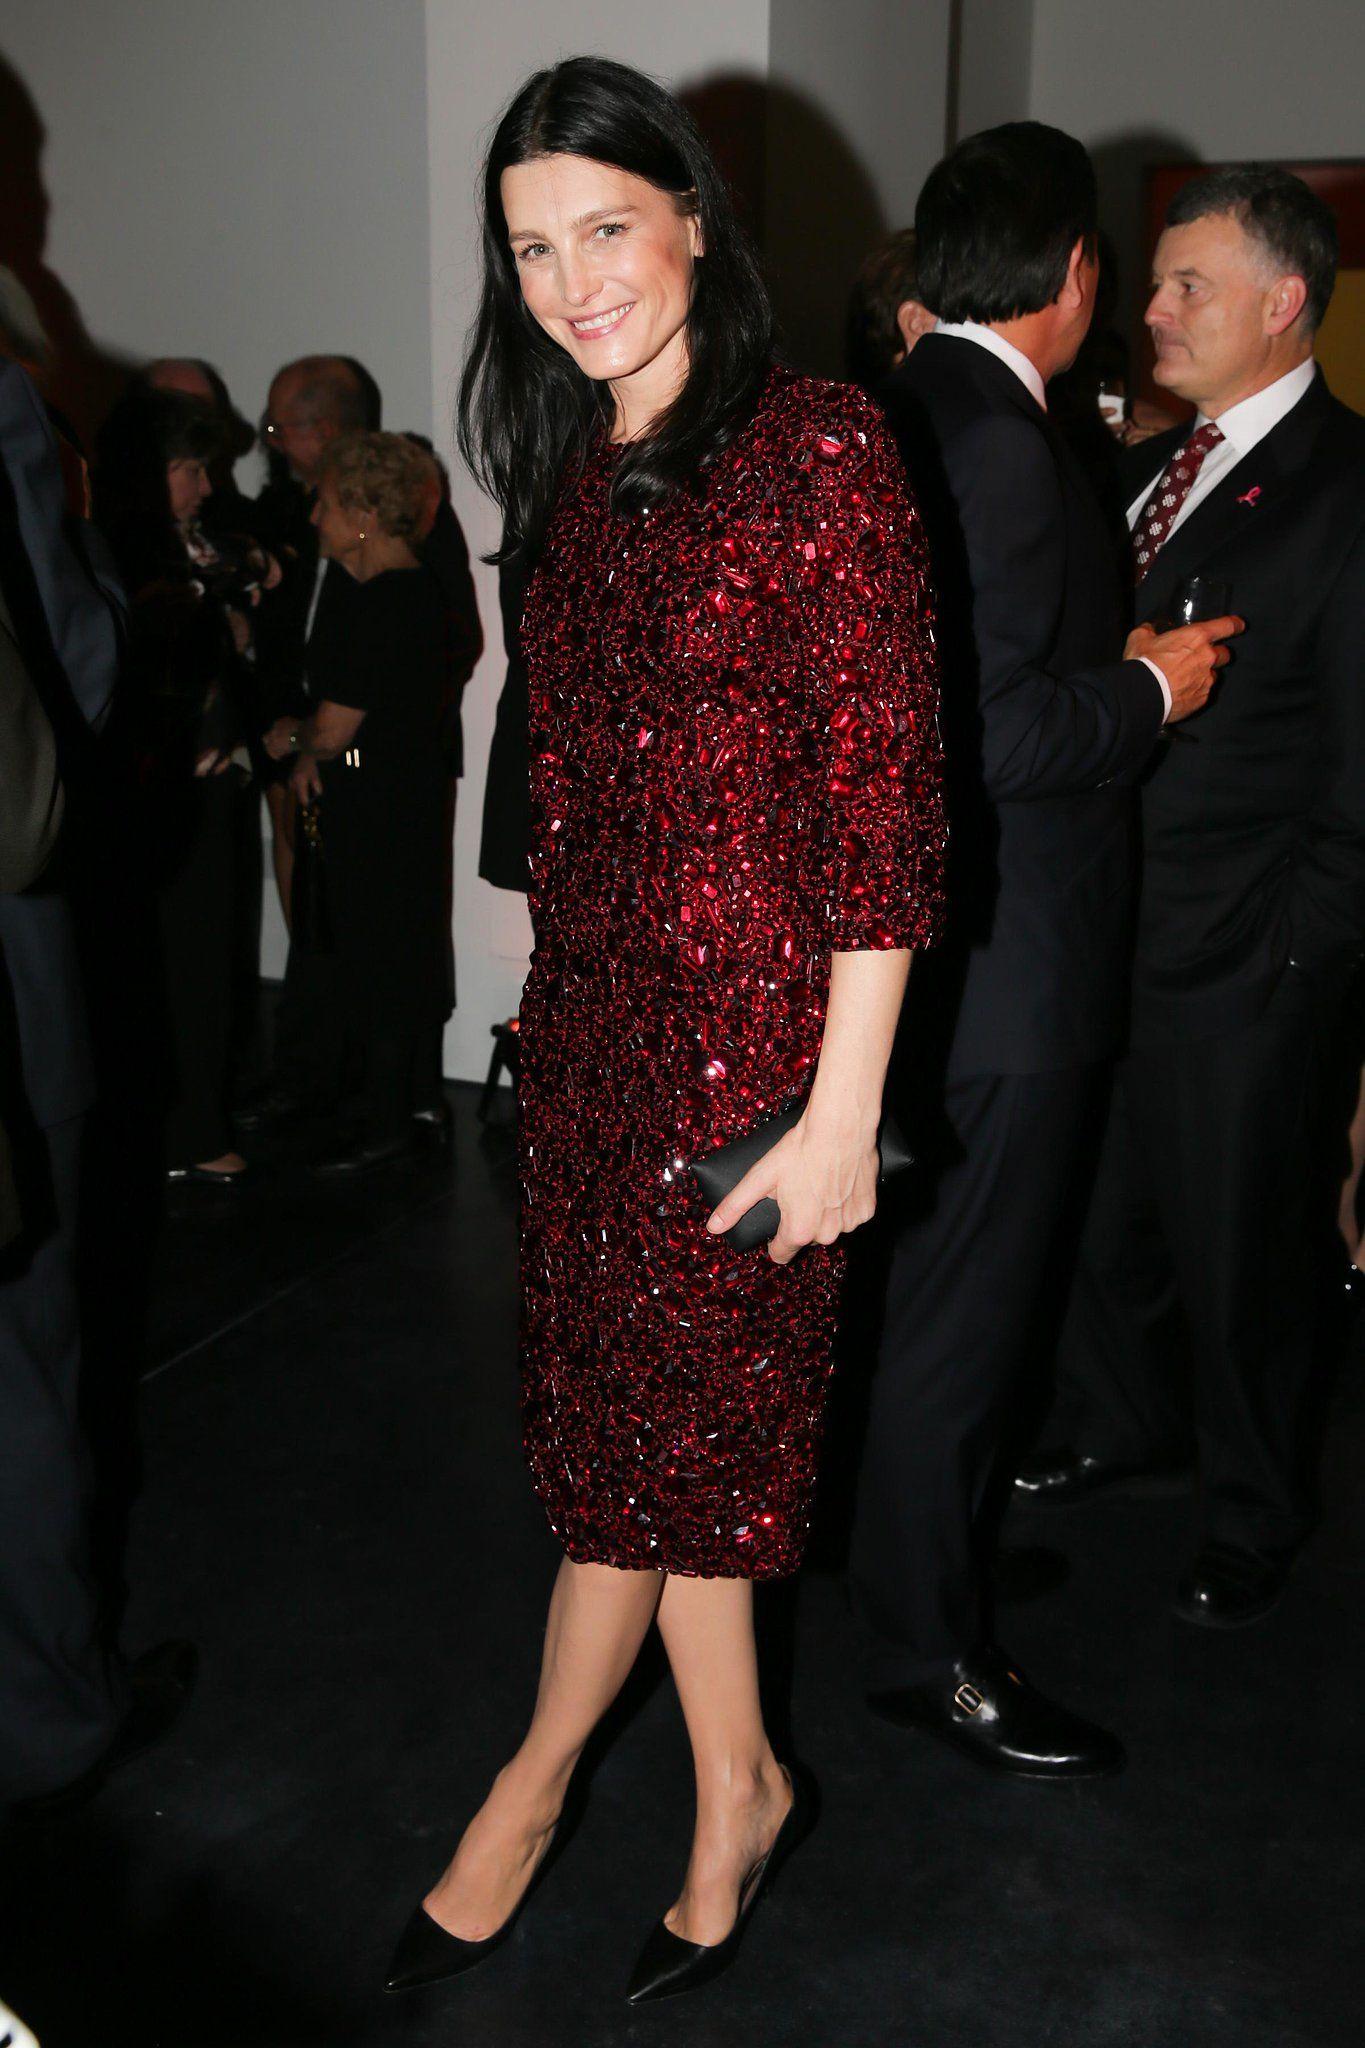 Tabitha-Simmons-sparkled-her-ruby-cocktail-dress-God-Love.jpg